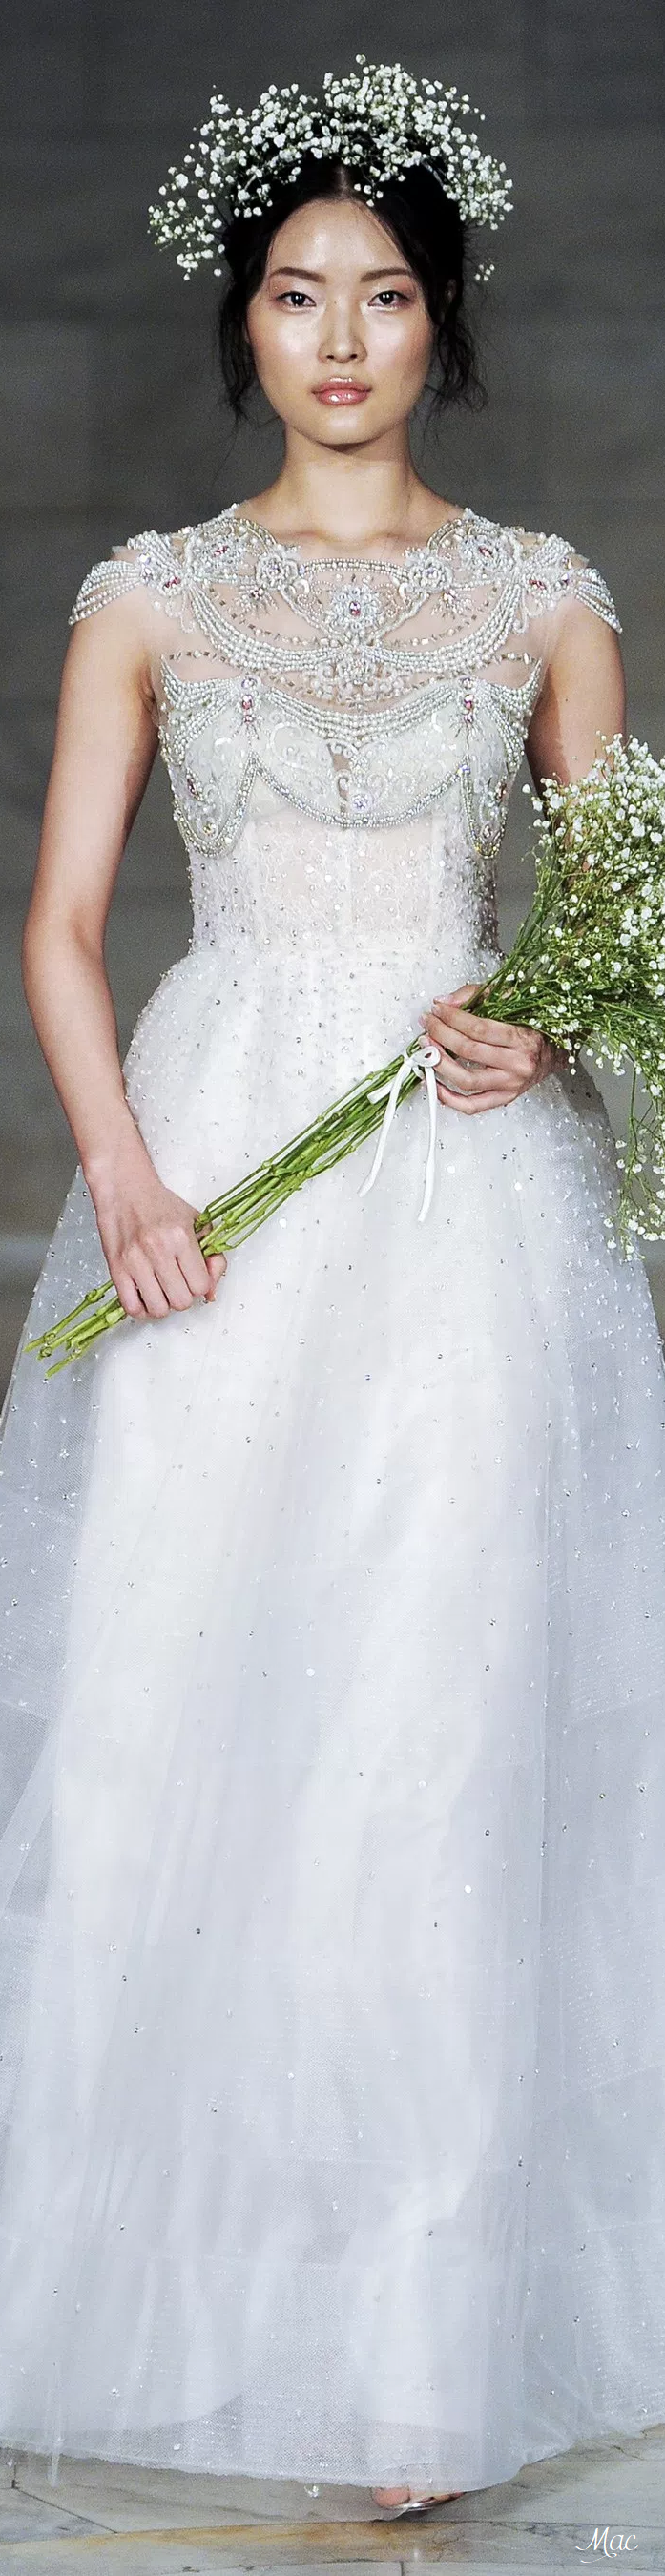 Fall bridal reem acra only a groom away pinterest